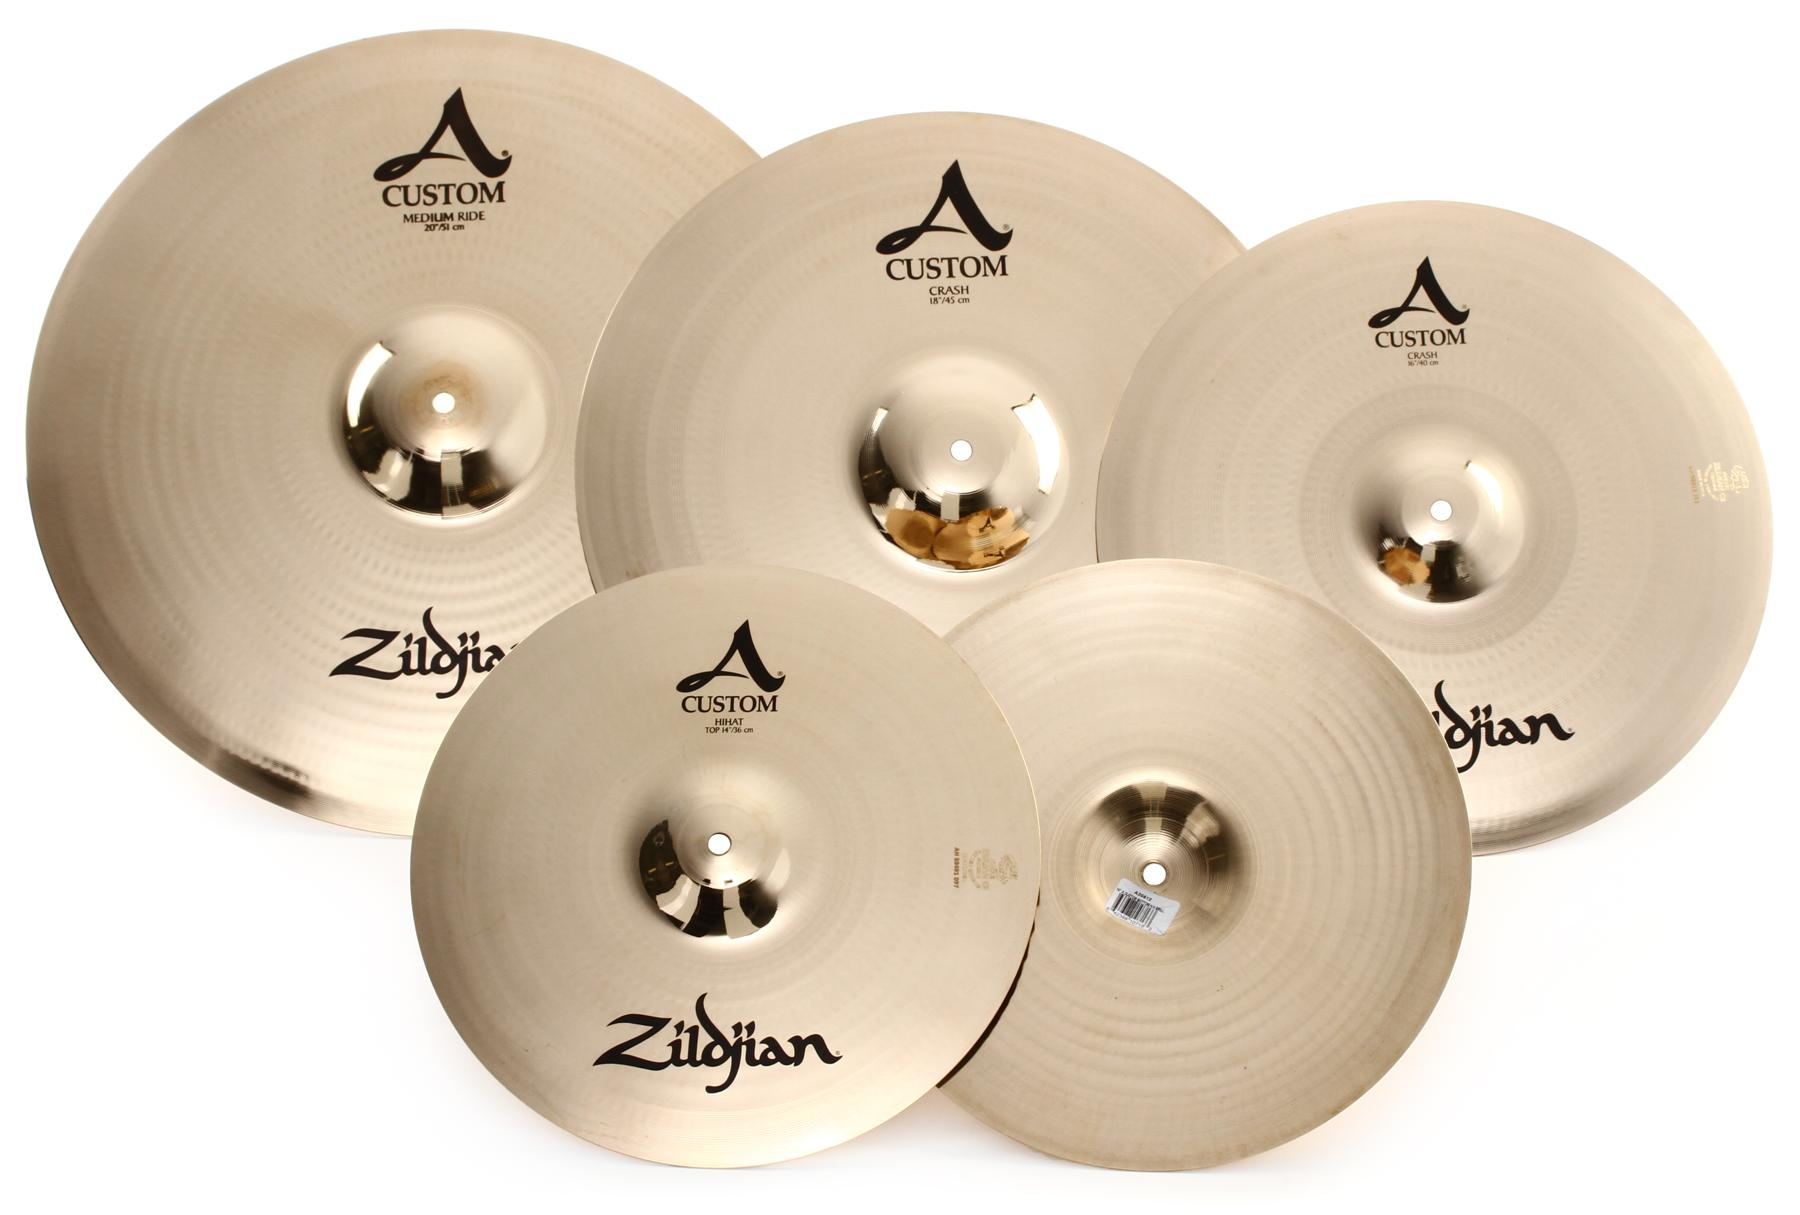 5. Zildjian A Custom Cymbal Set